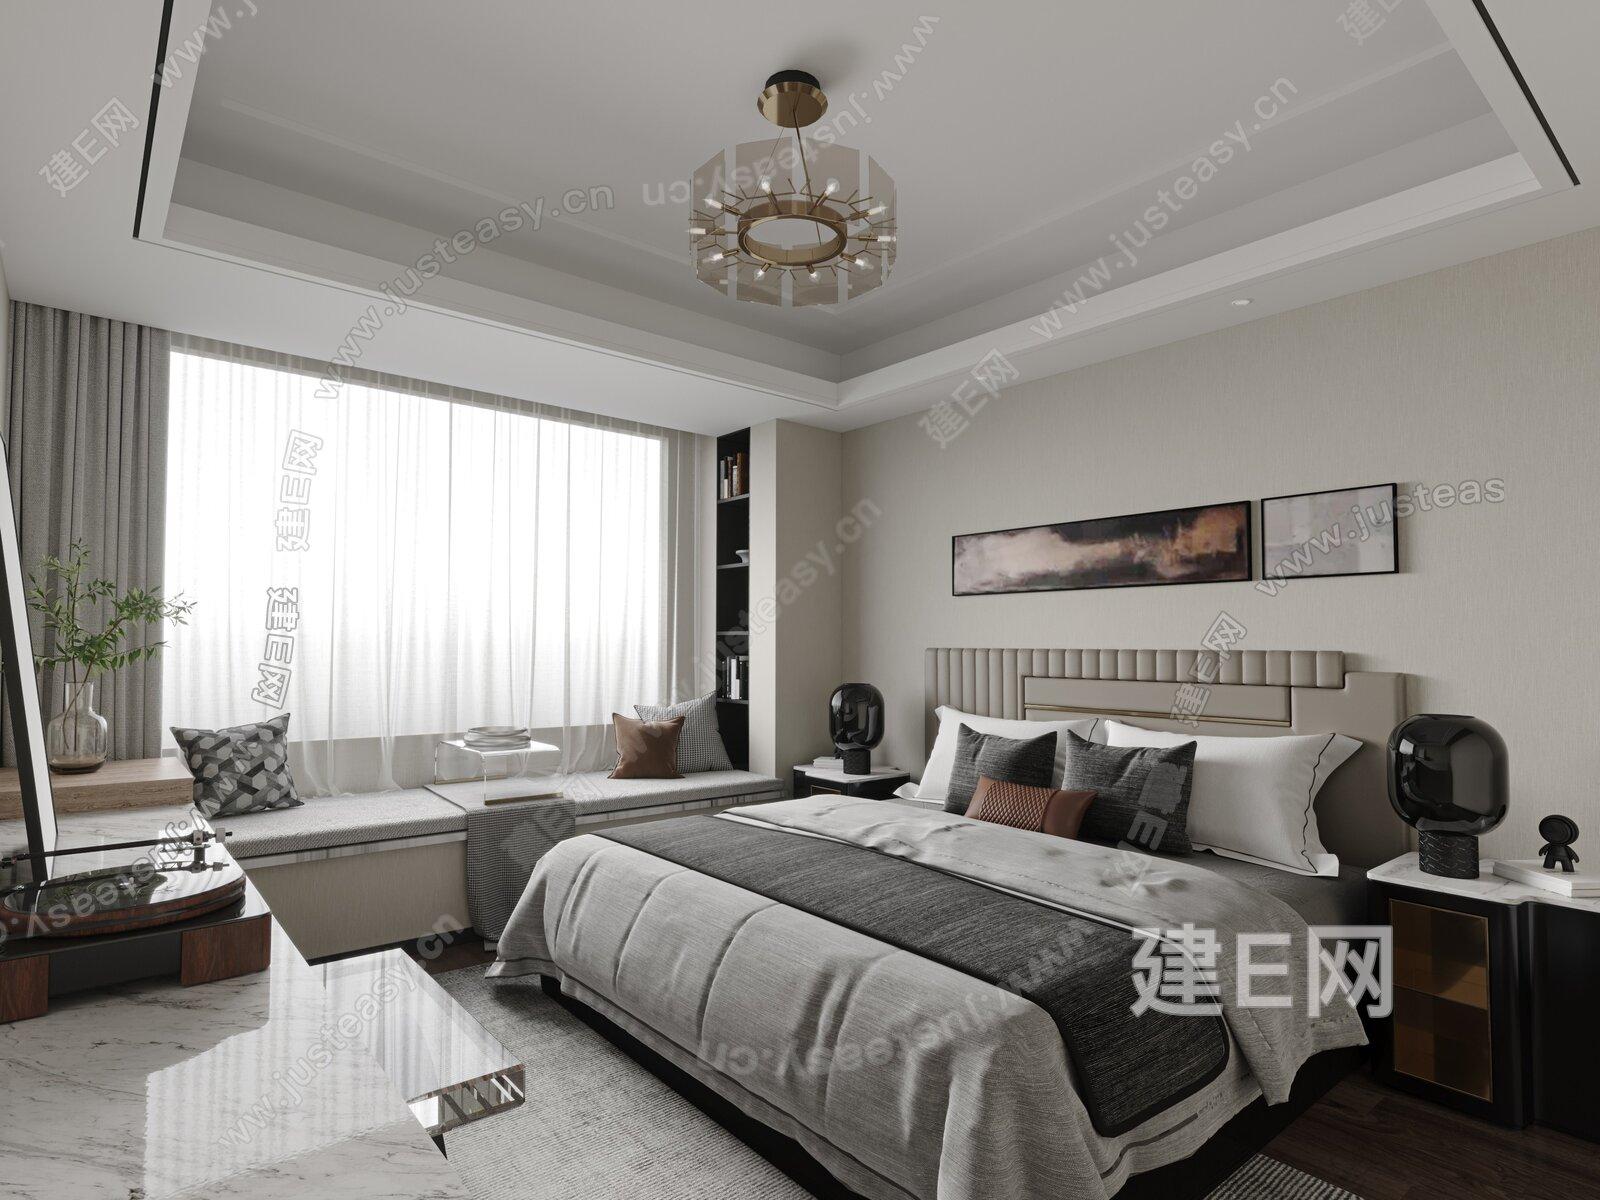 BEYOUND 必扬设计 现代轻奢卧室 3d模型